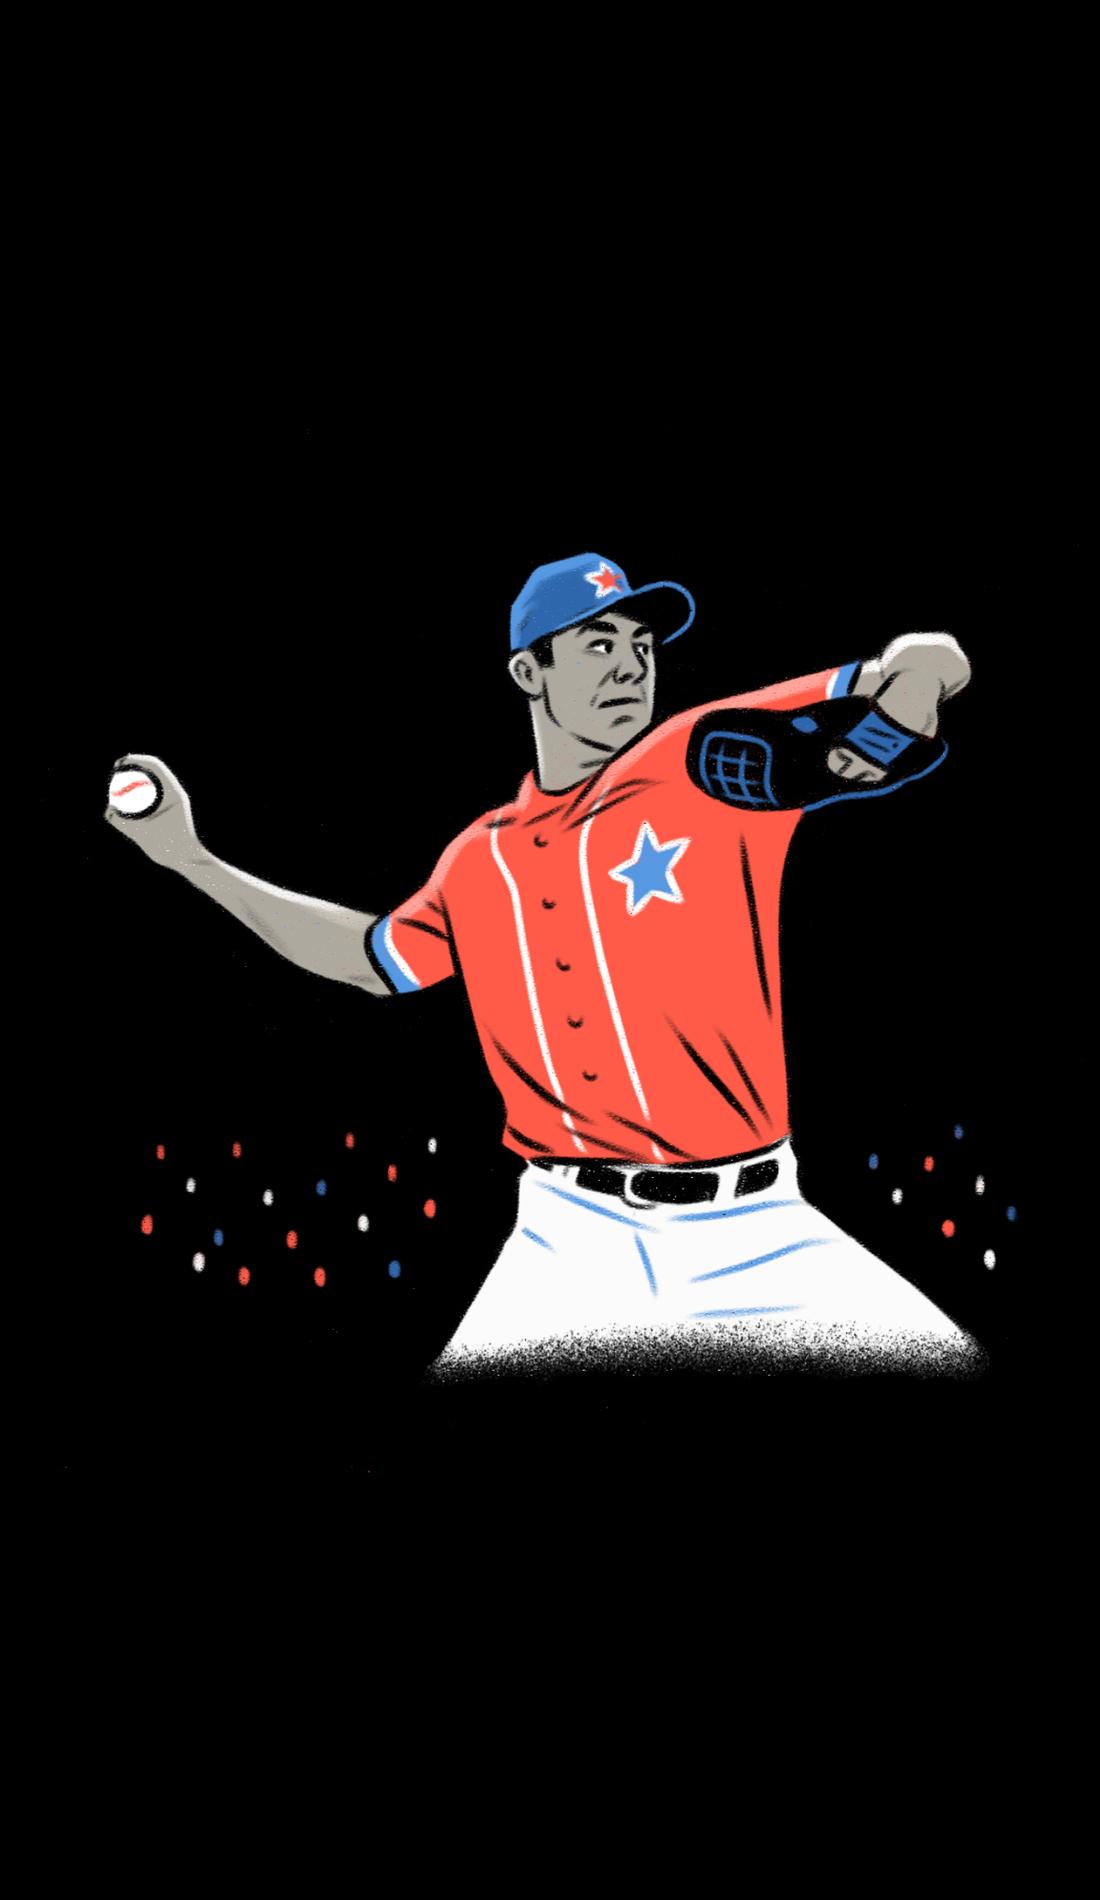 A University of Louisiana Monroe Warhawks Baseball live event